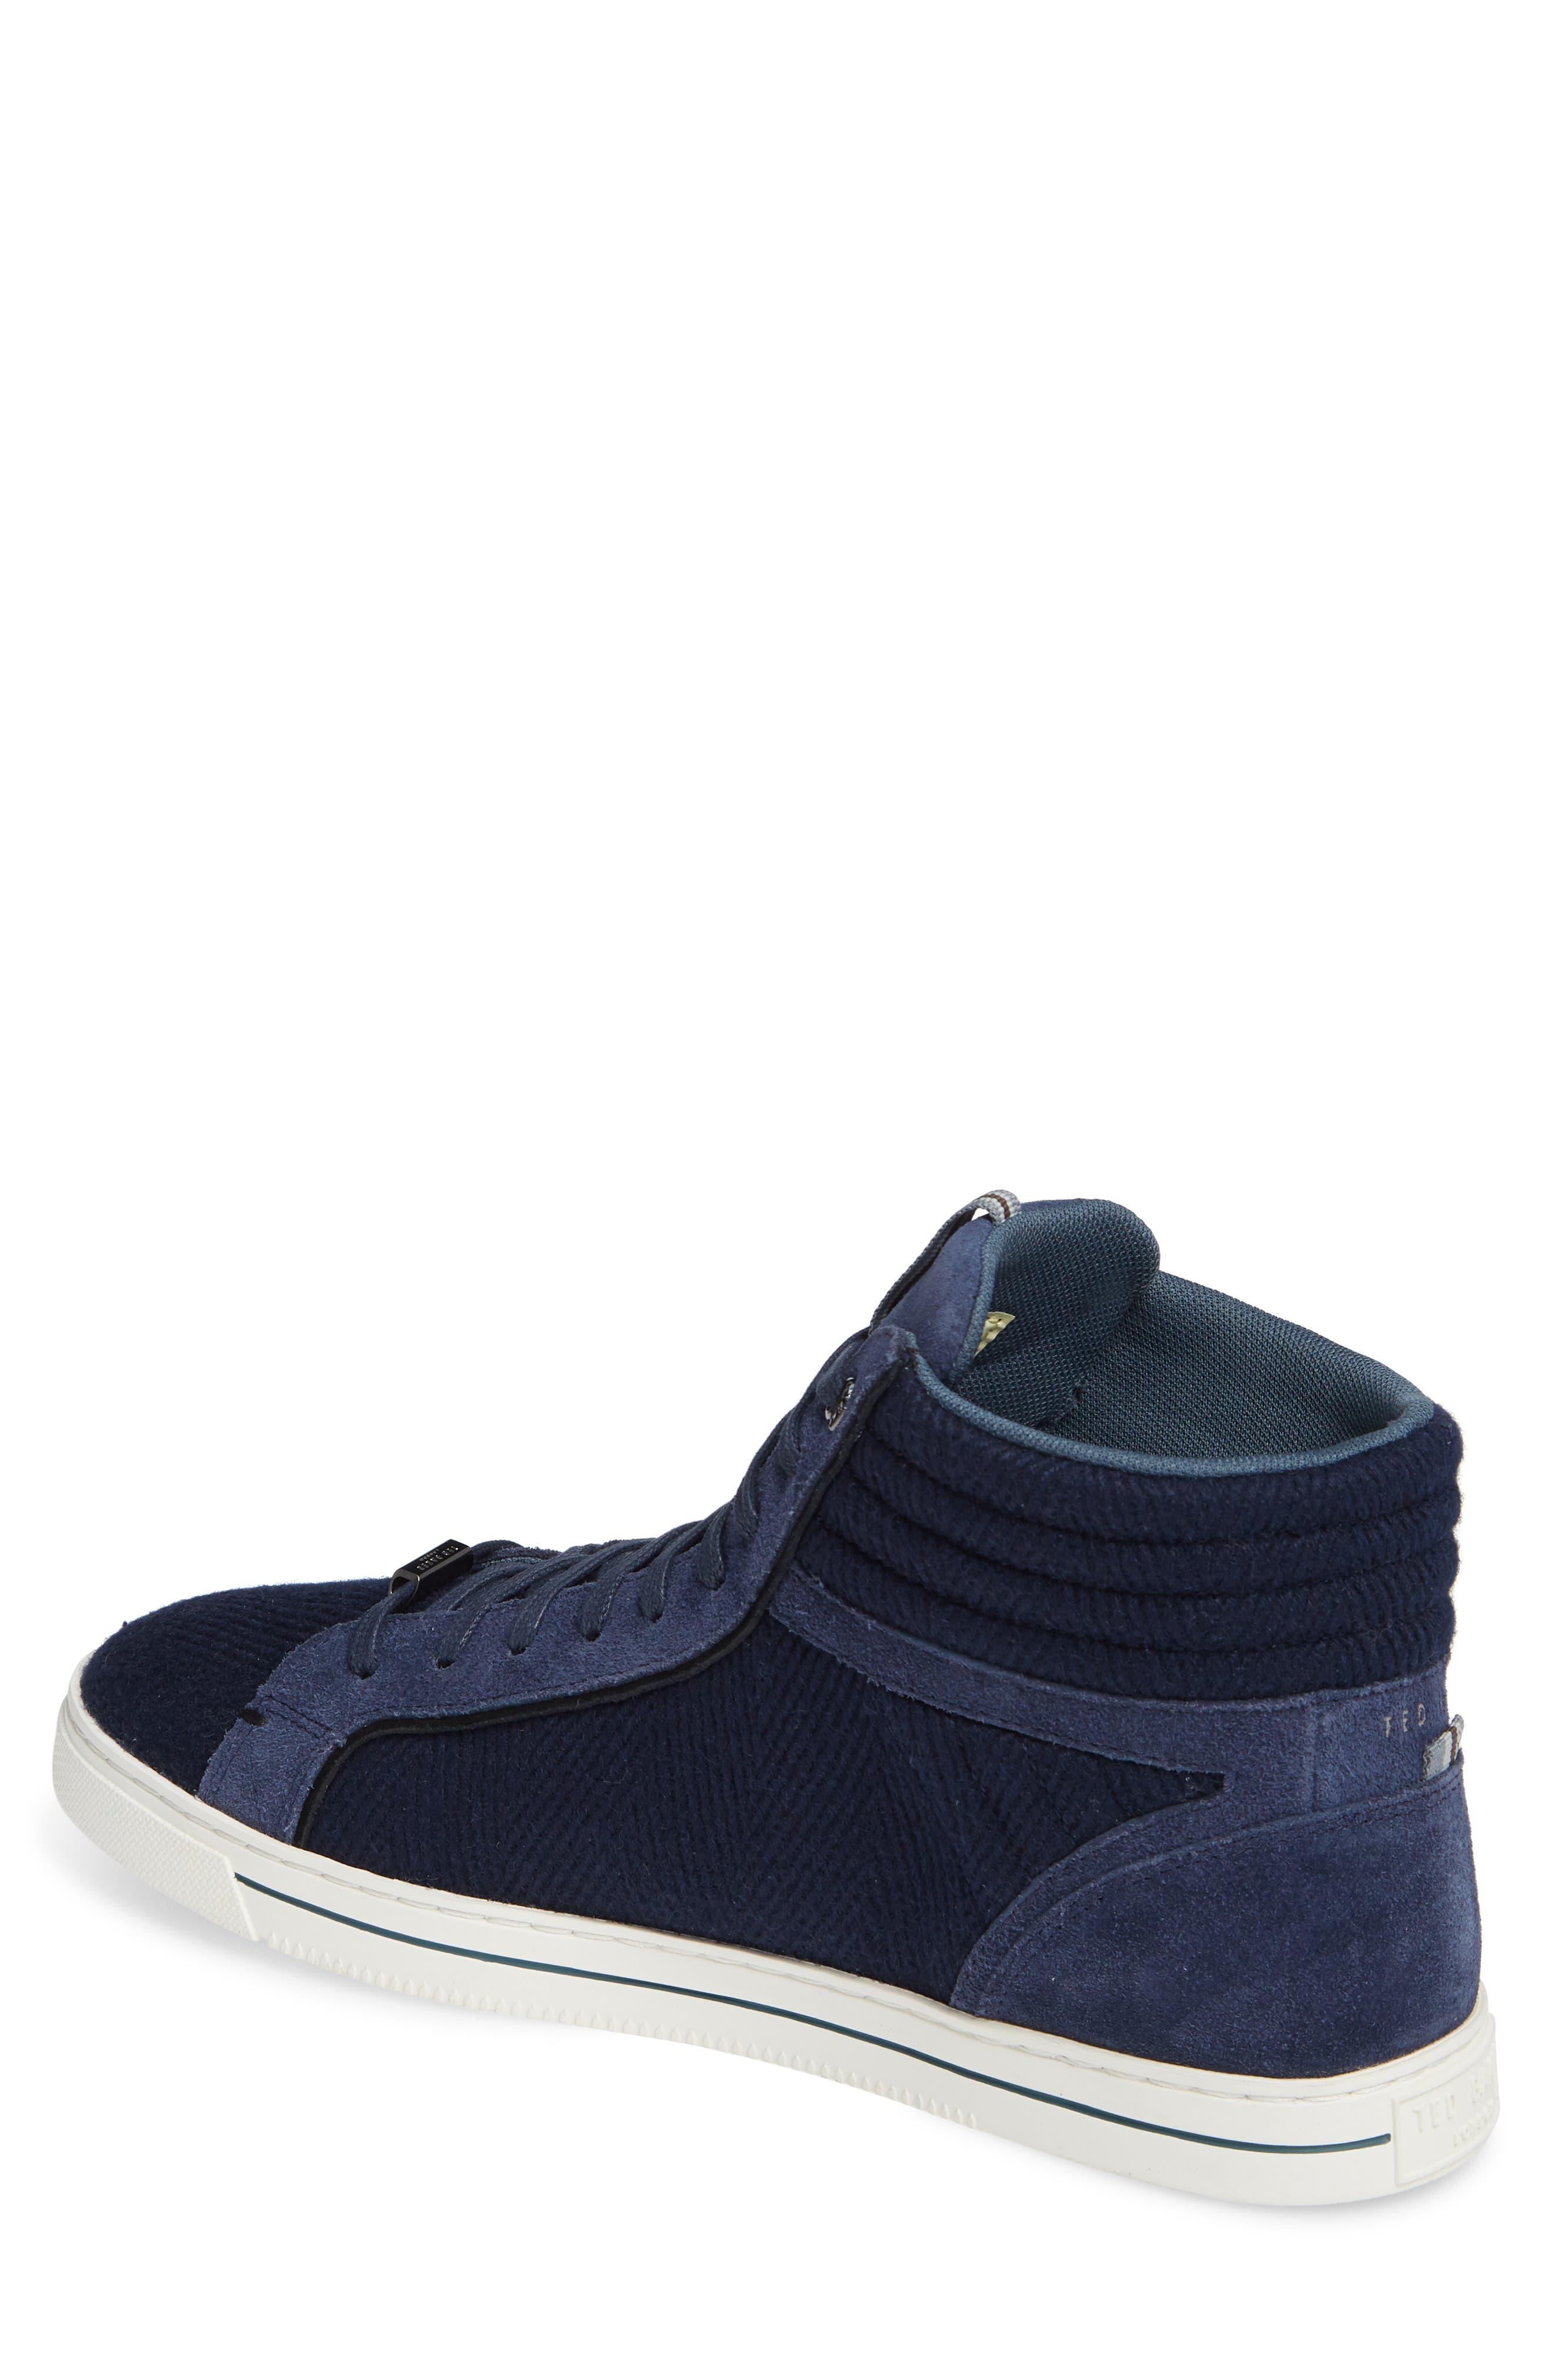 Luckan High Top Sneaker,                             Alternate thumbnail 2, color,                             DARK BLUE FABRIC